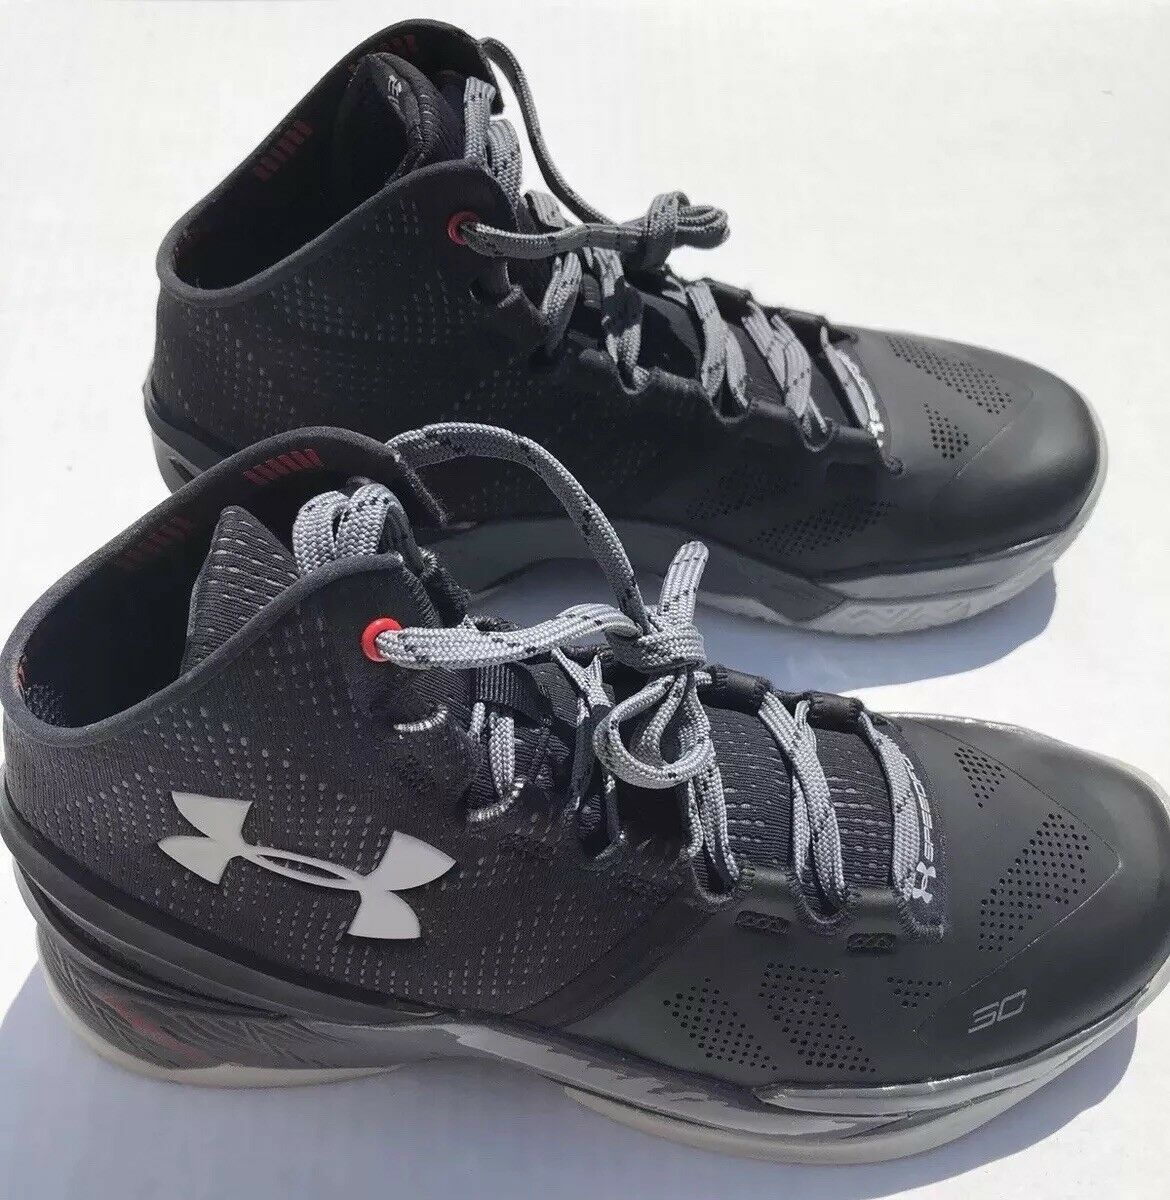 DS Under Armour Curry 2 SC30 Basketball schuhe 1259007-003 Größe 9 BRAND NEW